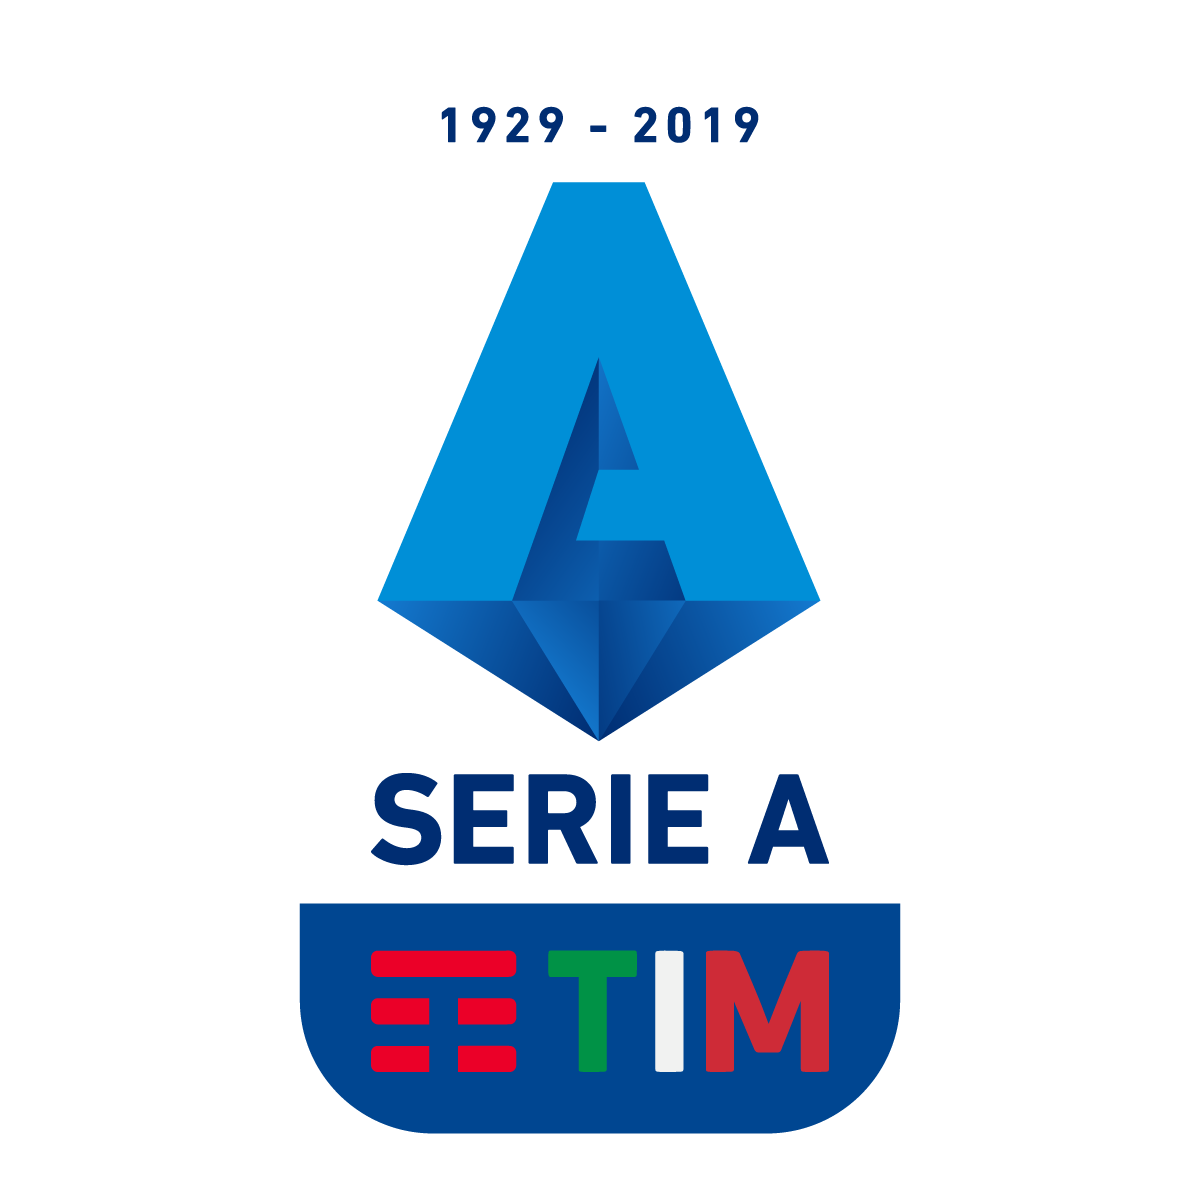 Inter v Sampdoria postponed, new date to be confirmed - U.C. Sampdoria